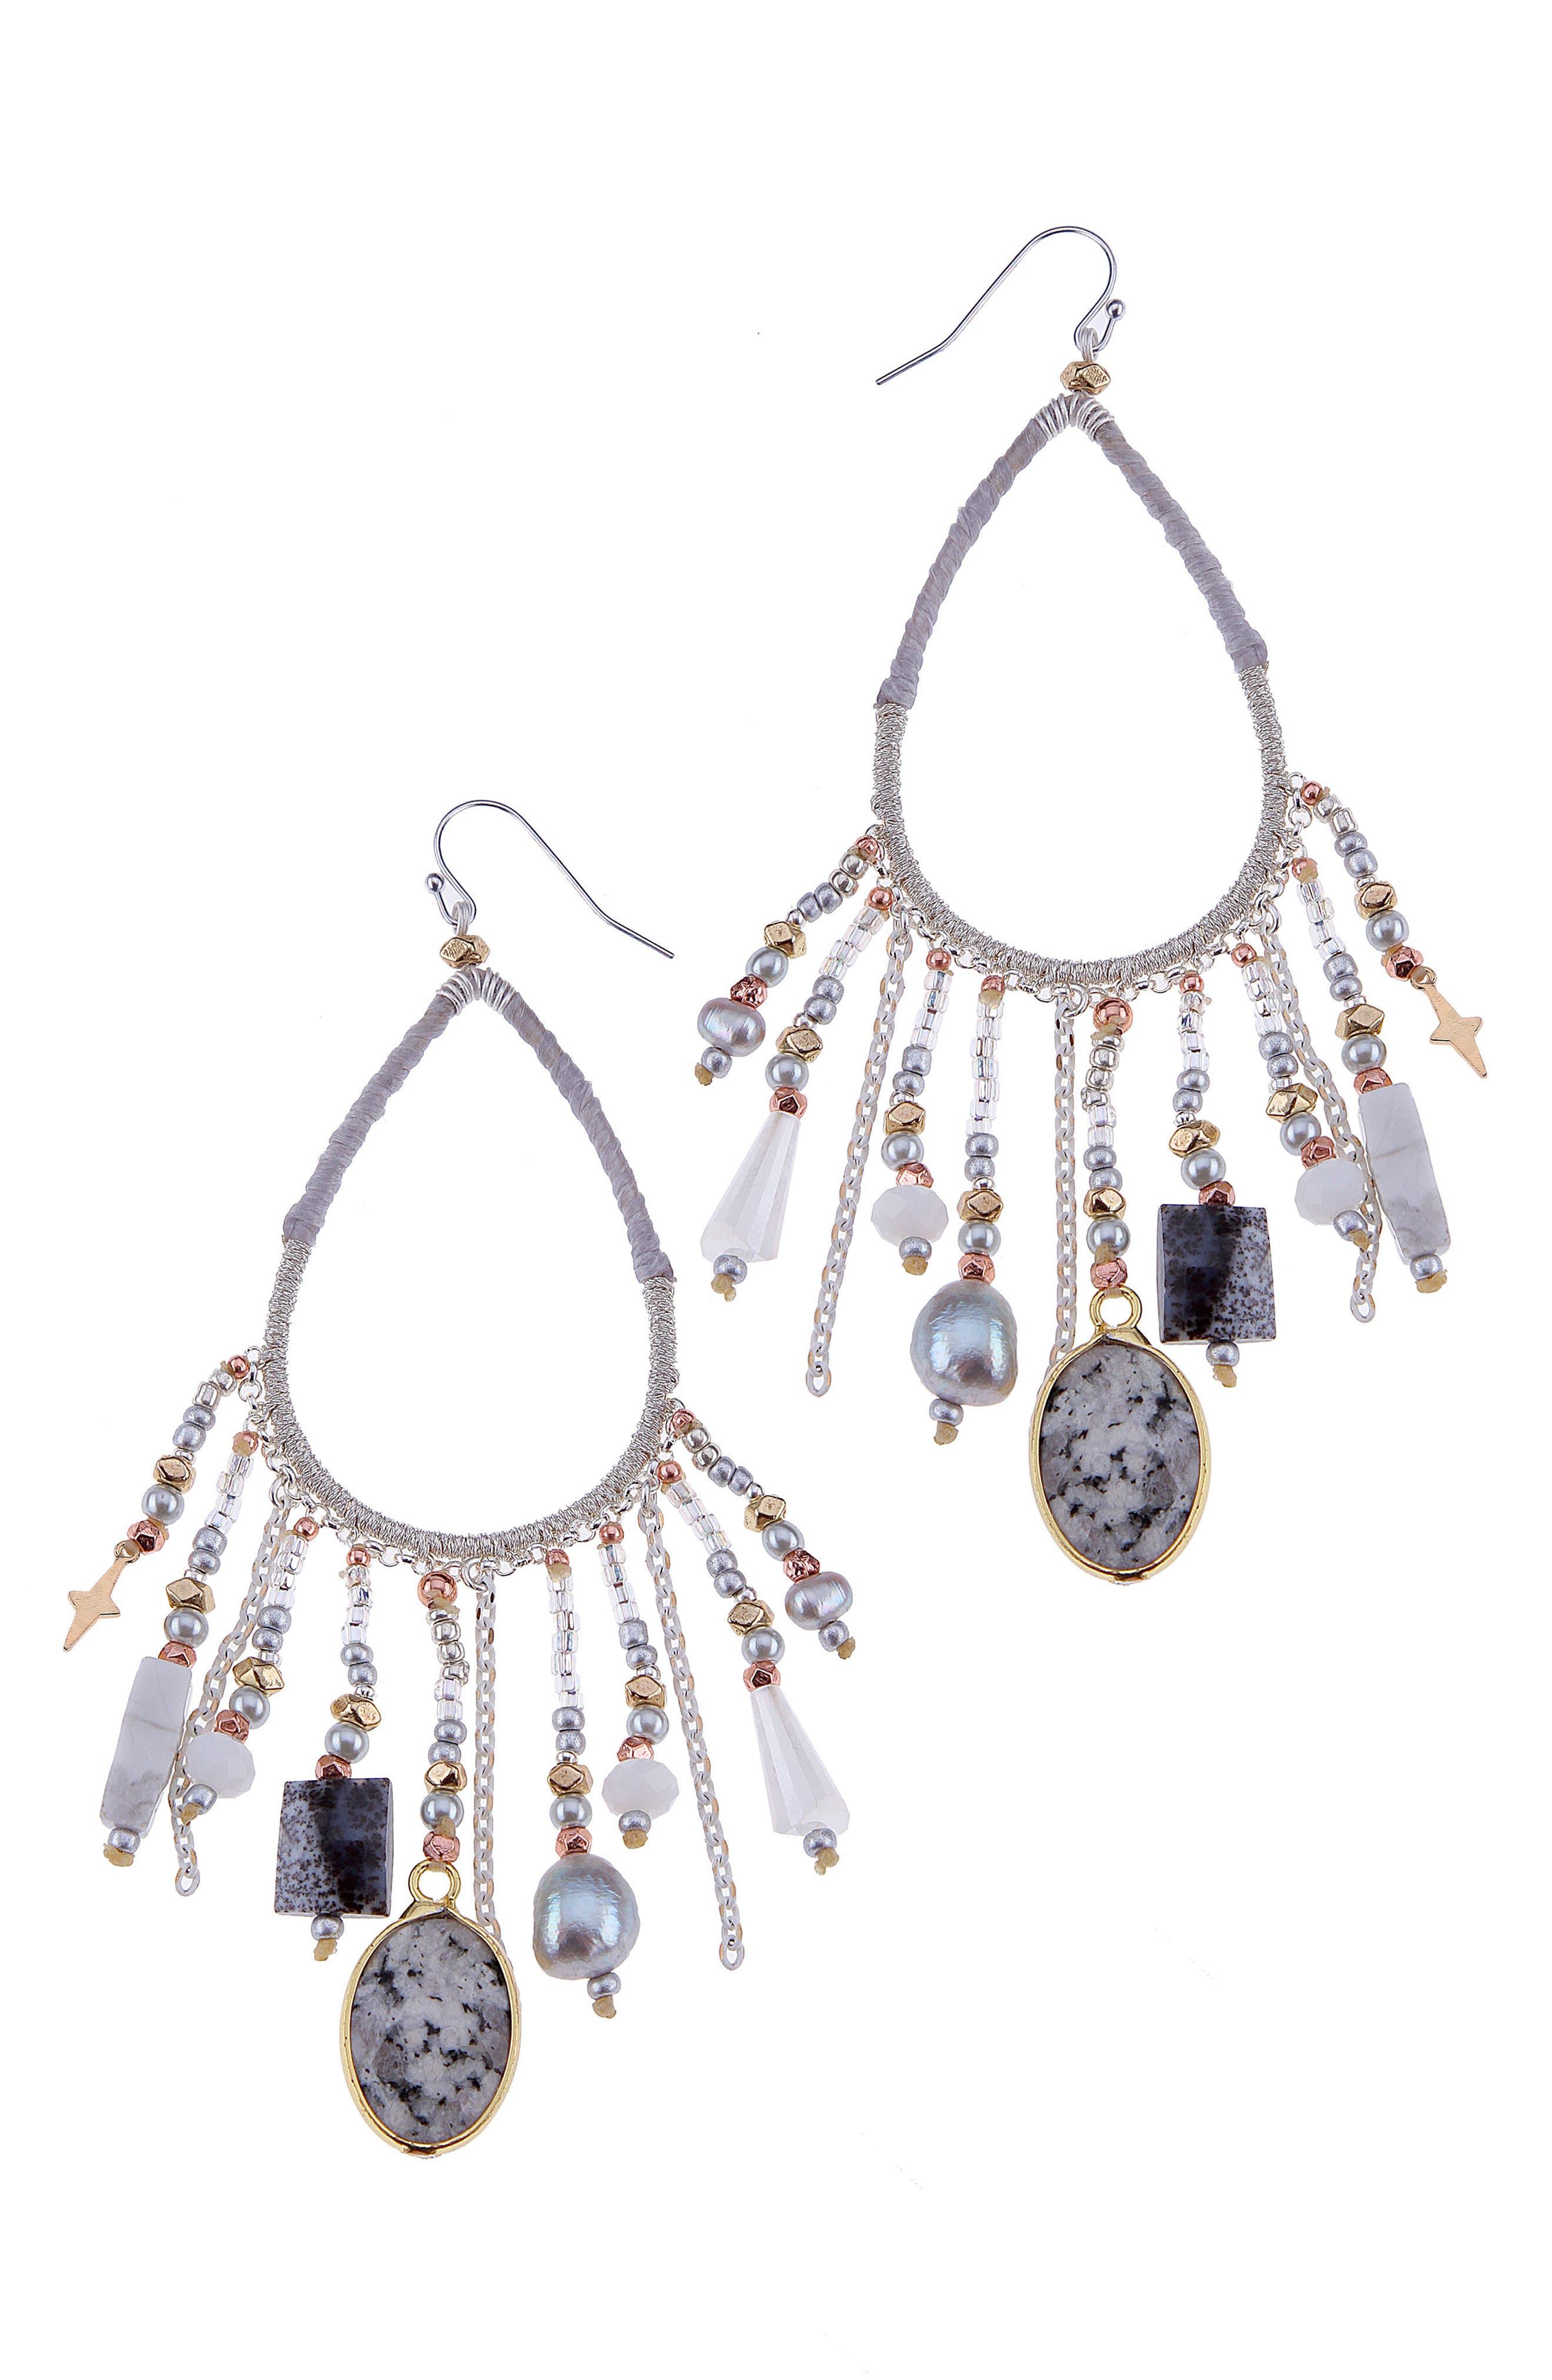 Stone & Star Charm Earrings,                         Main,                         color, Grey